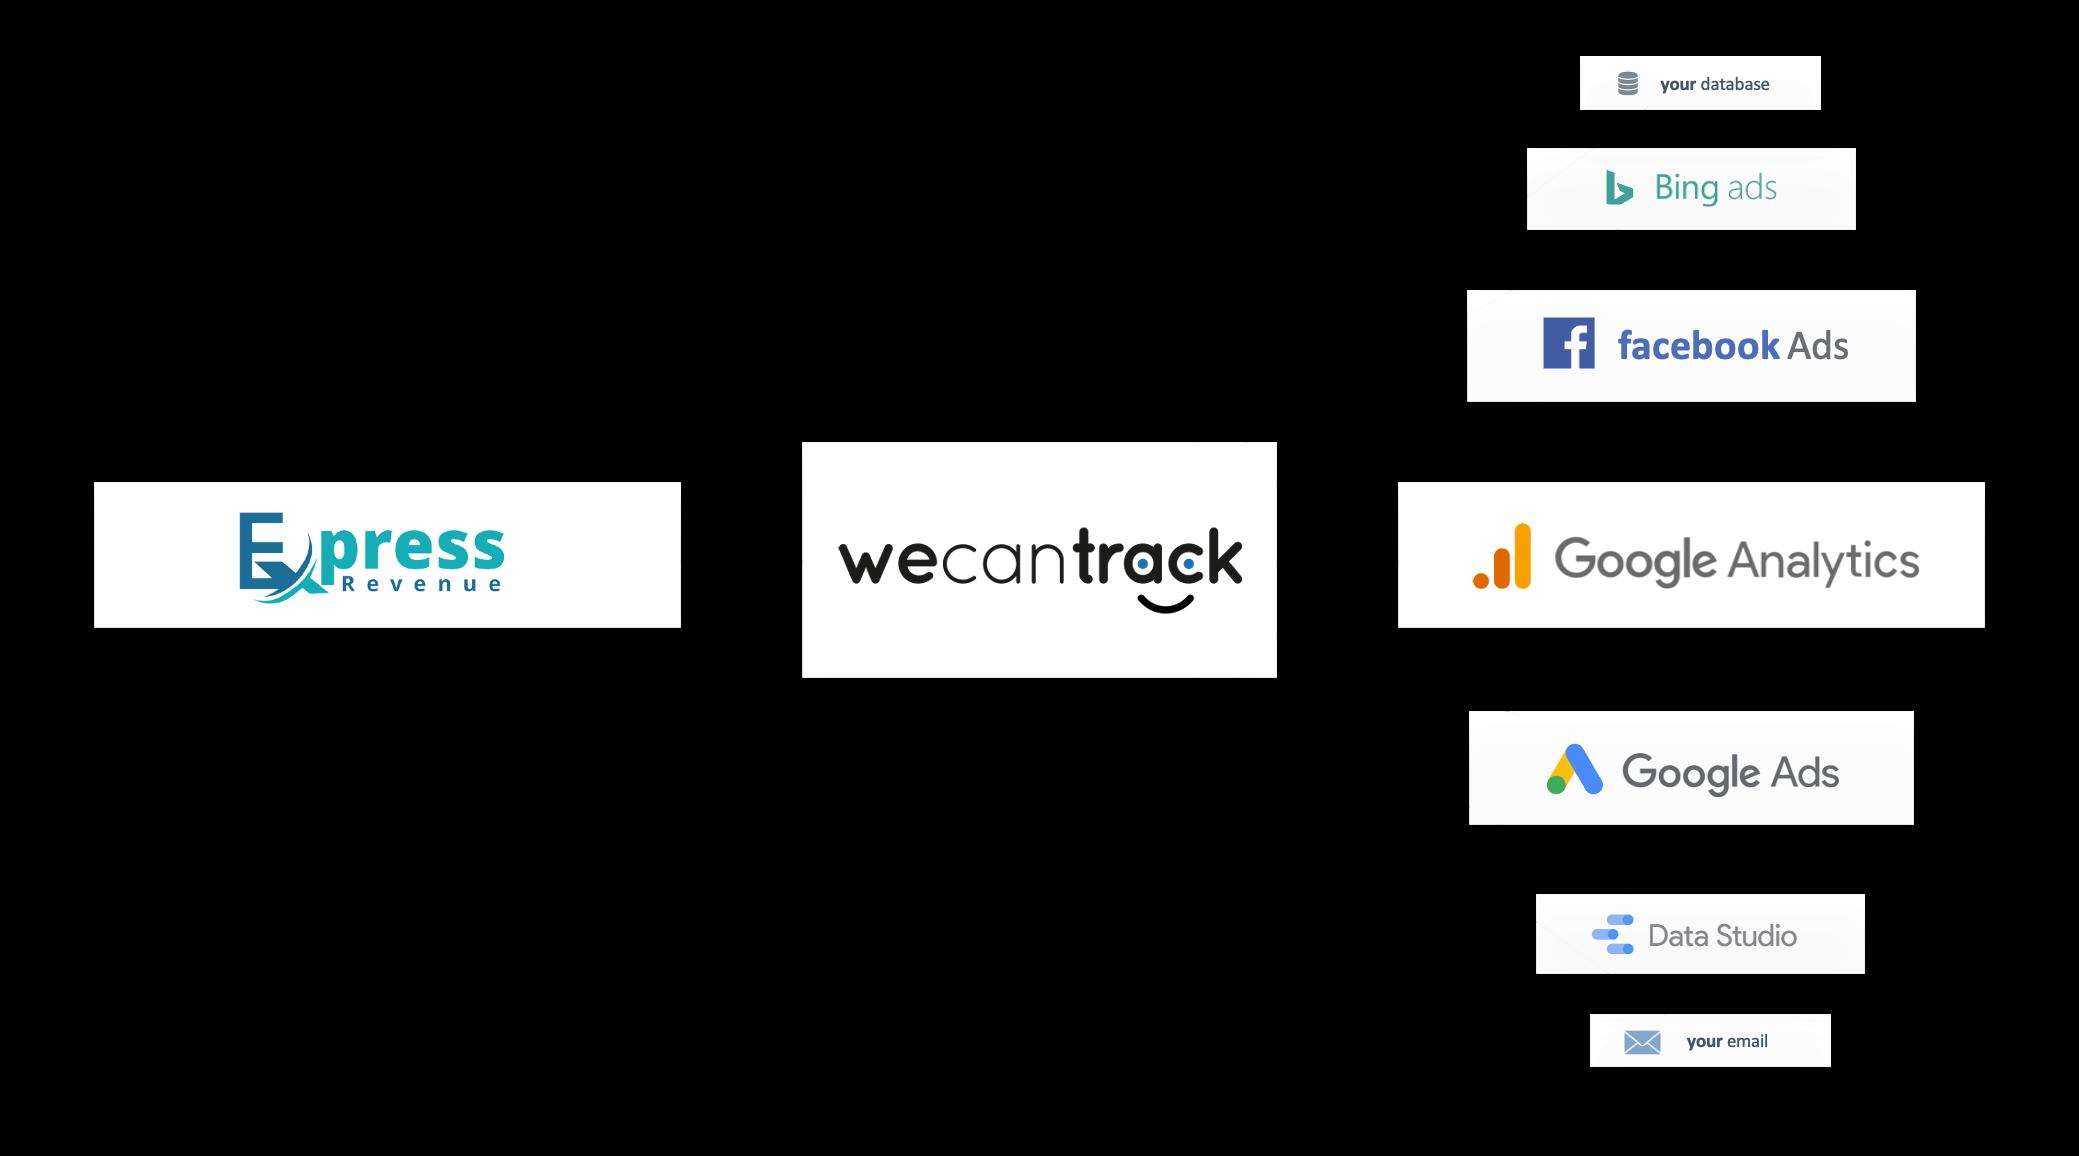 integrate-express-revenue-affiliate-conversions-via-postback-url